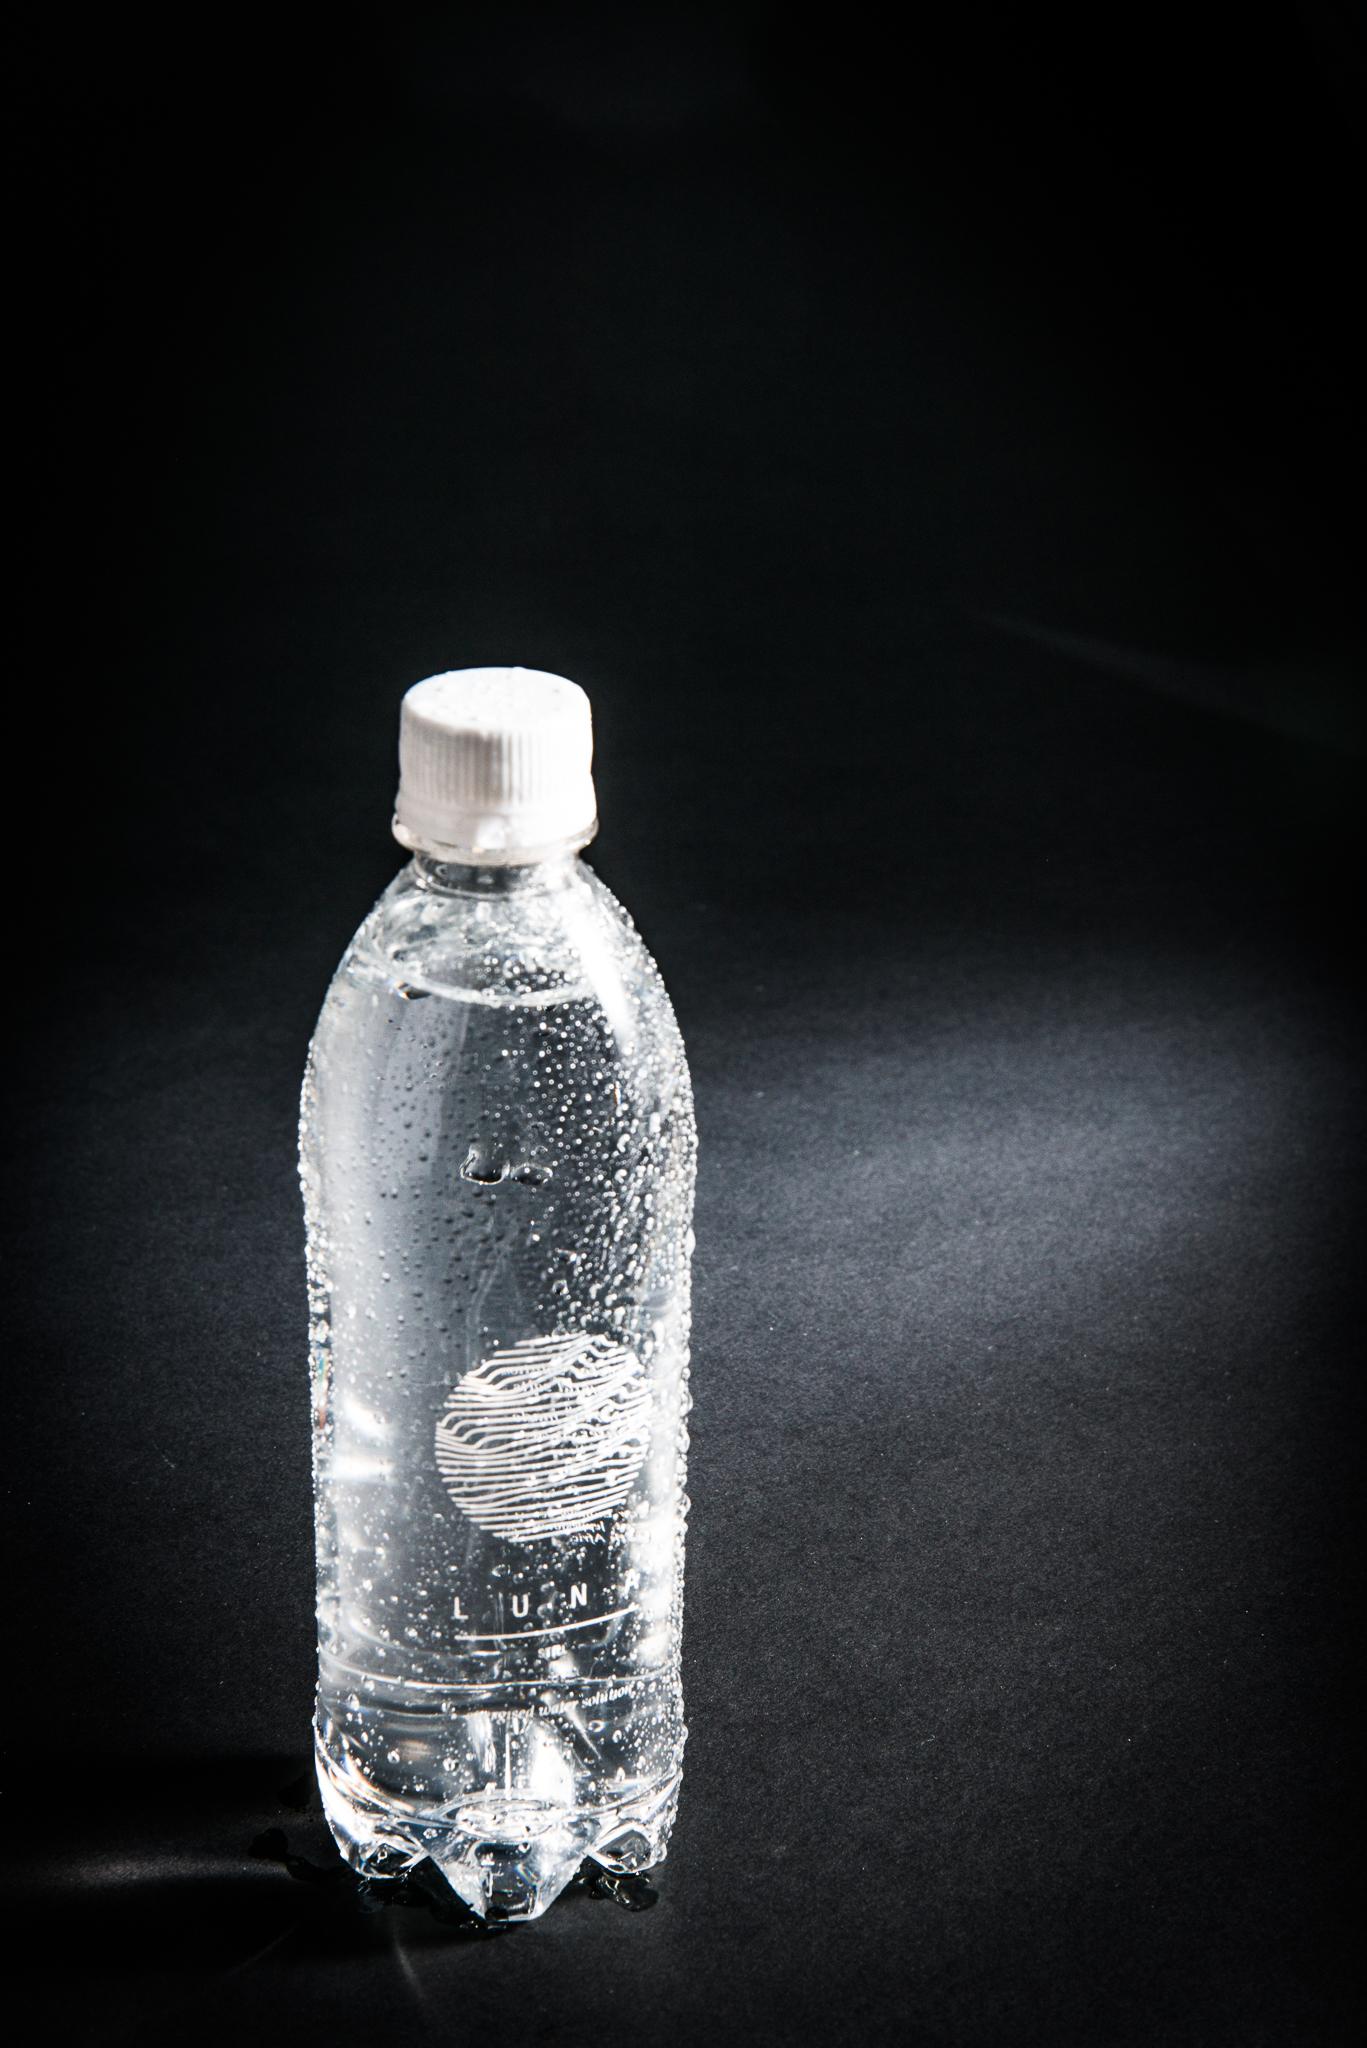 LUNA Water00010.jpg